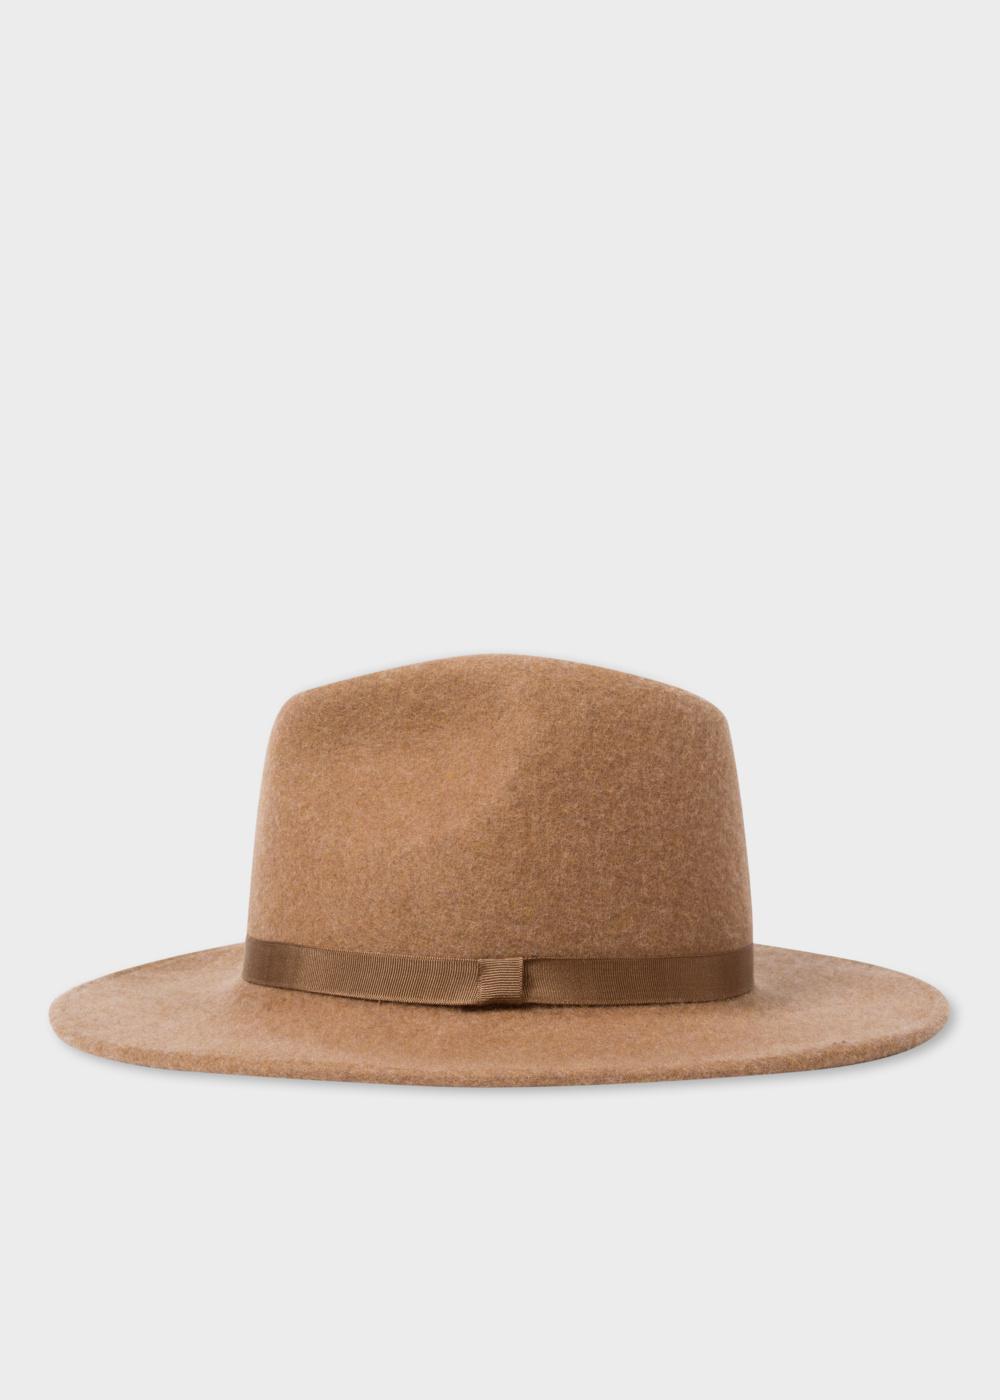 Paul Smith Women s Tan Lined Wool Fedora Hat in Brown - Lyst f9c31ebaedc